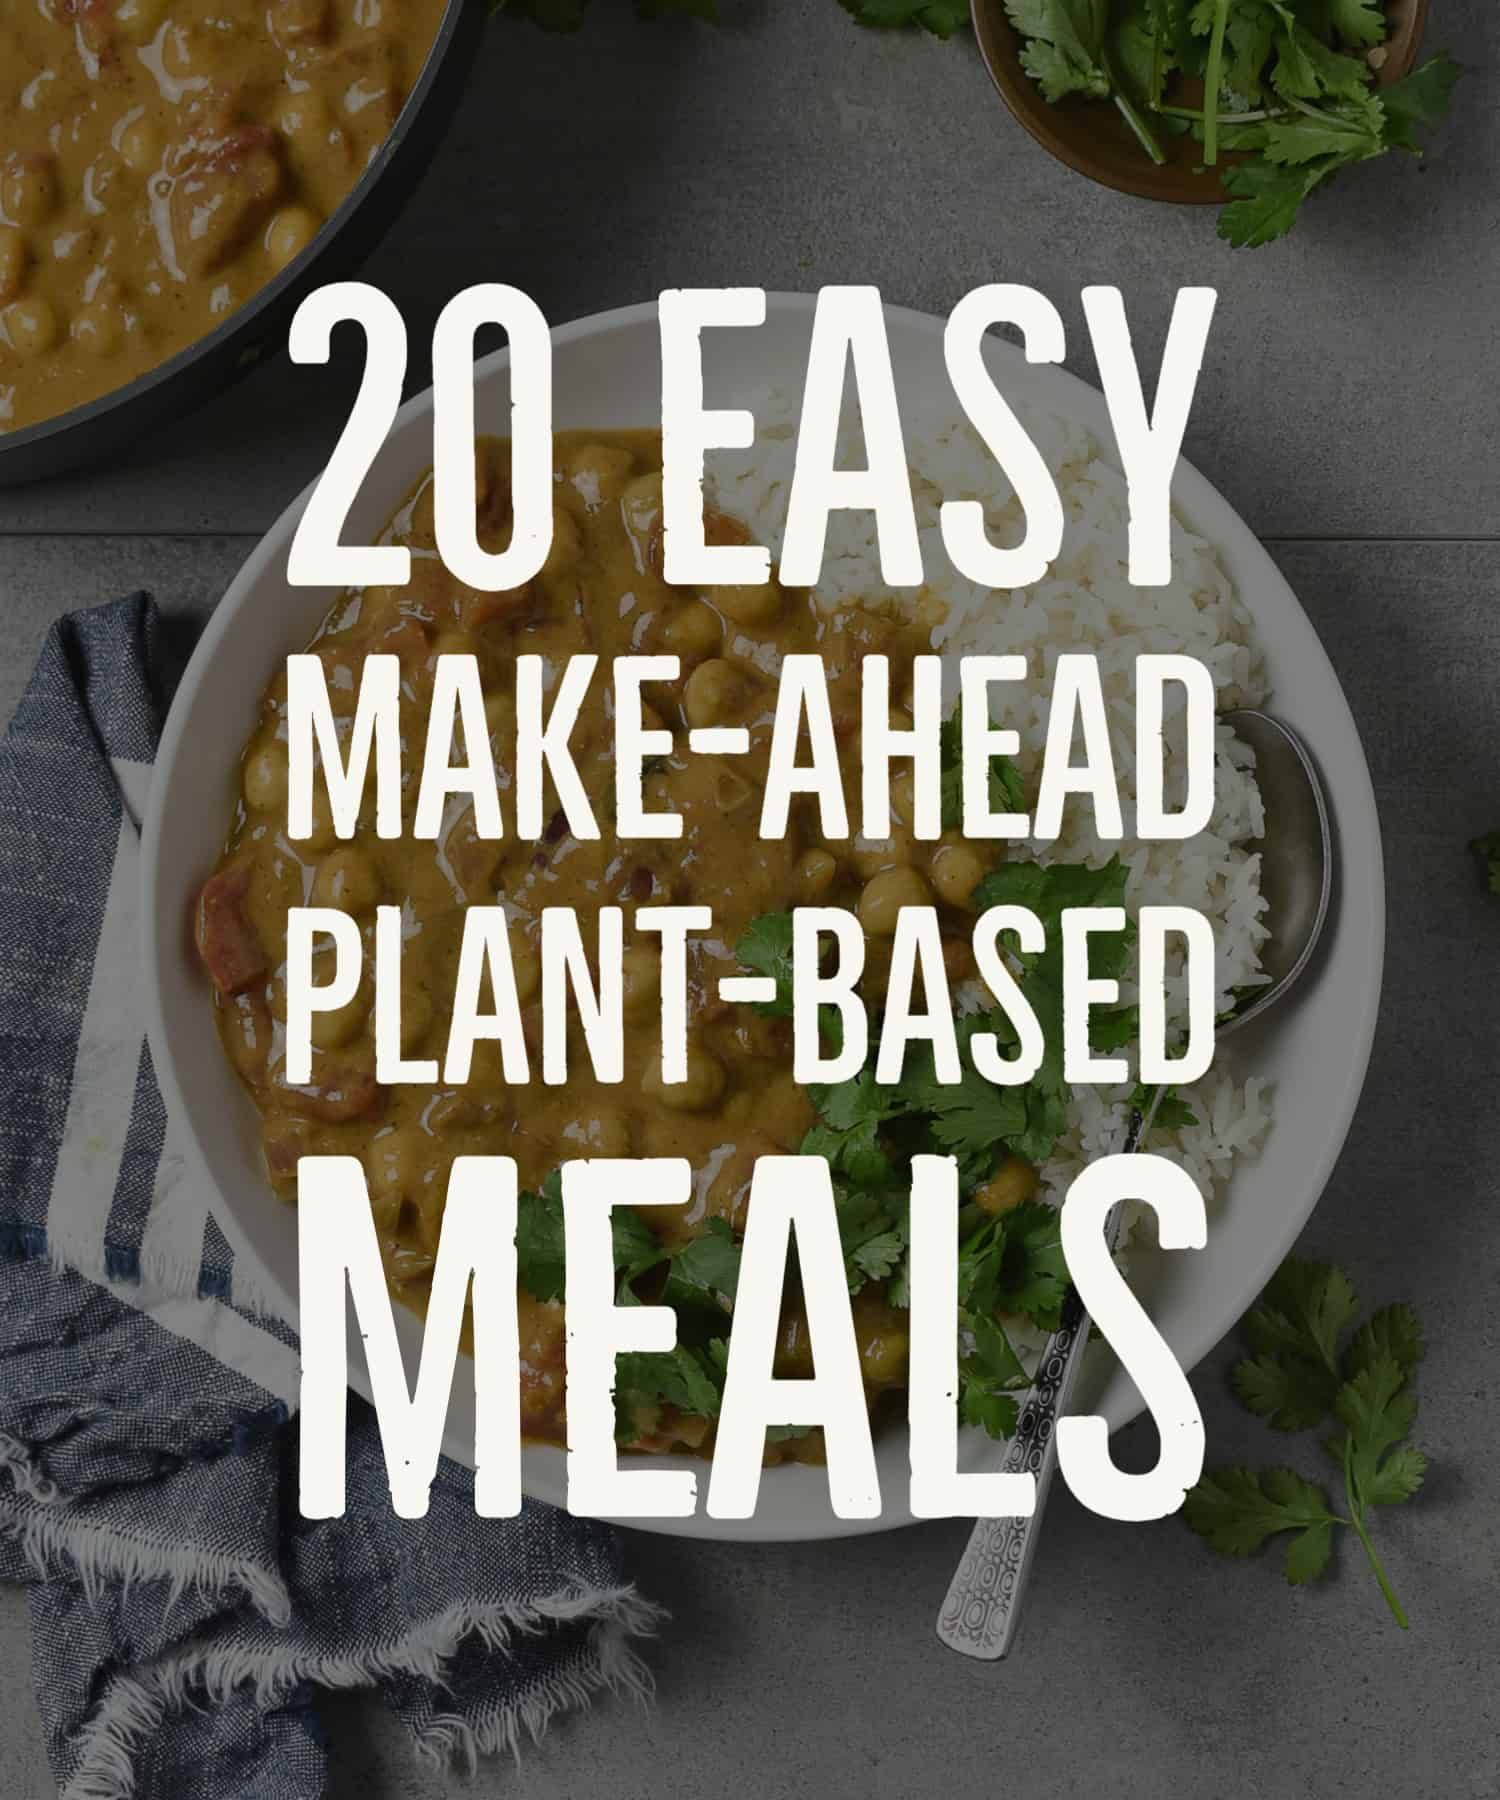 20 easy make ahead plant based meals HEADER.